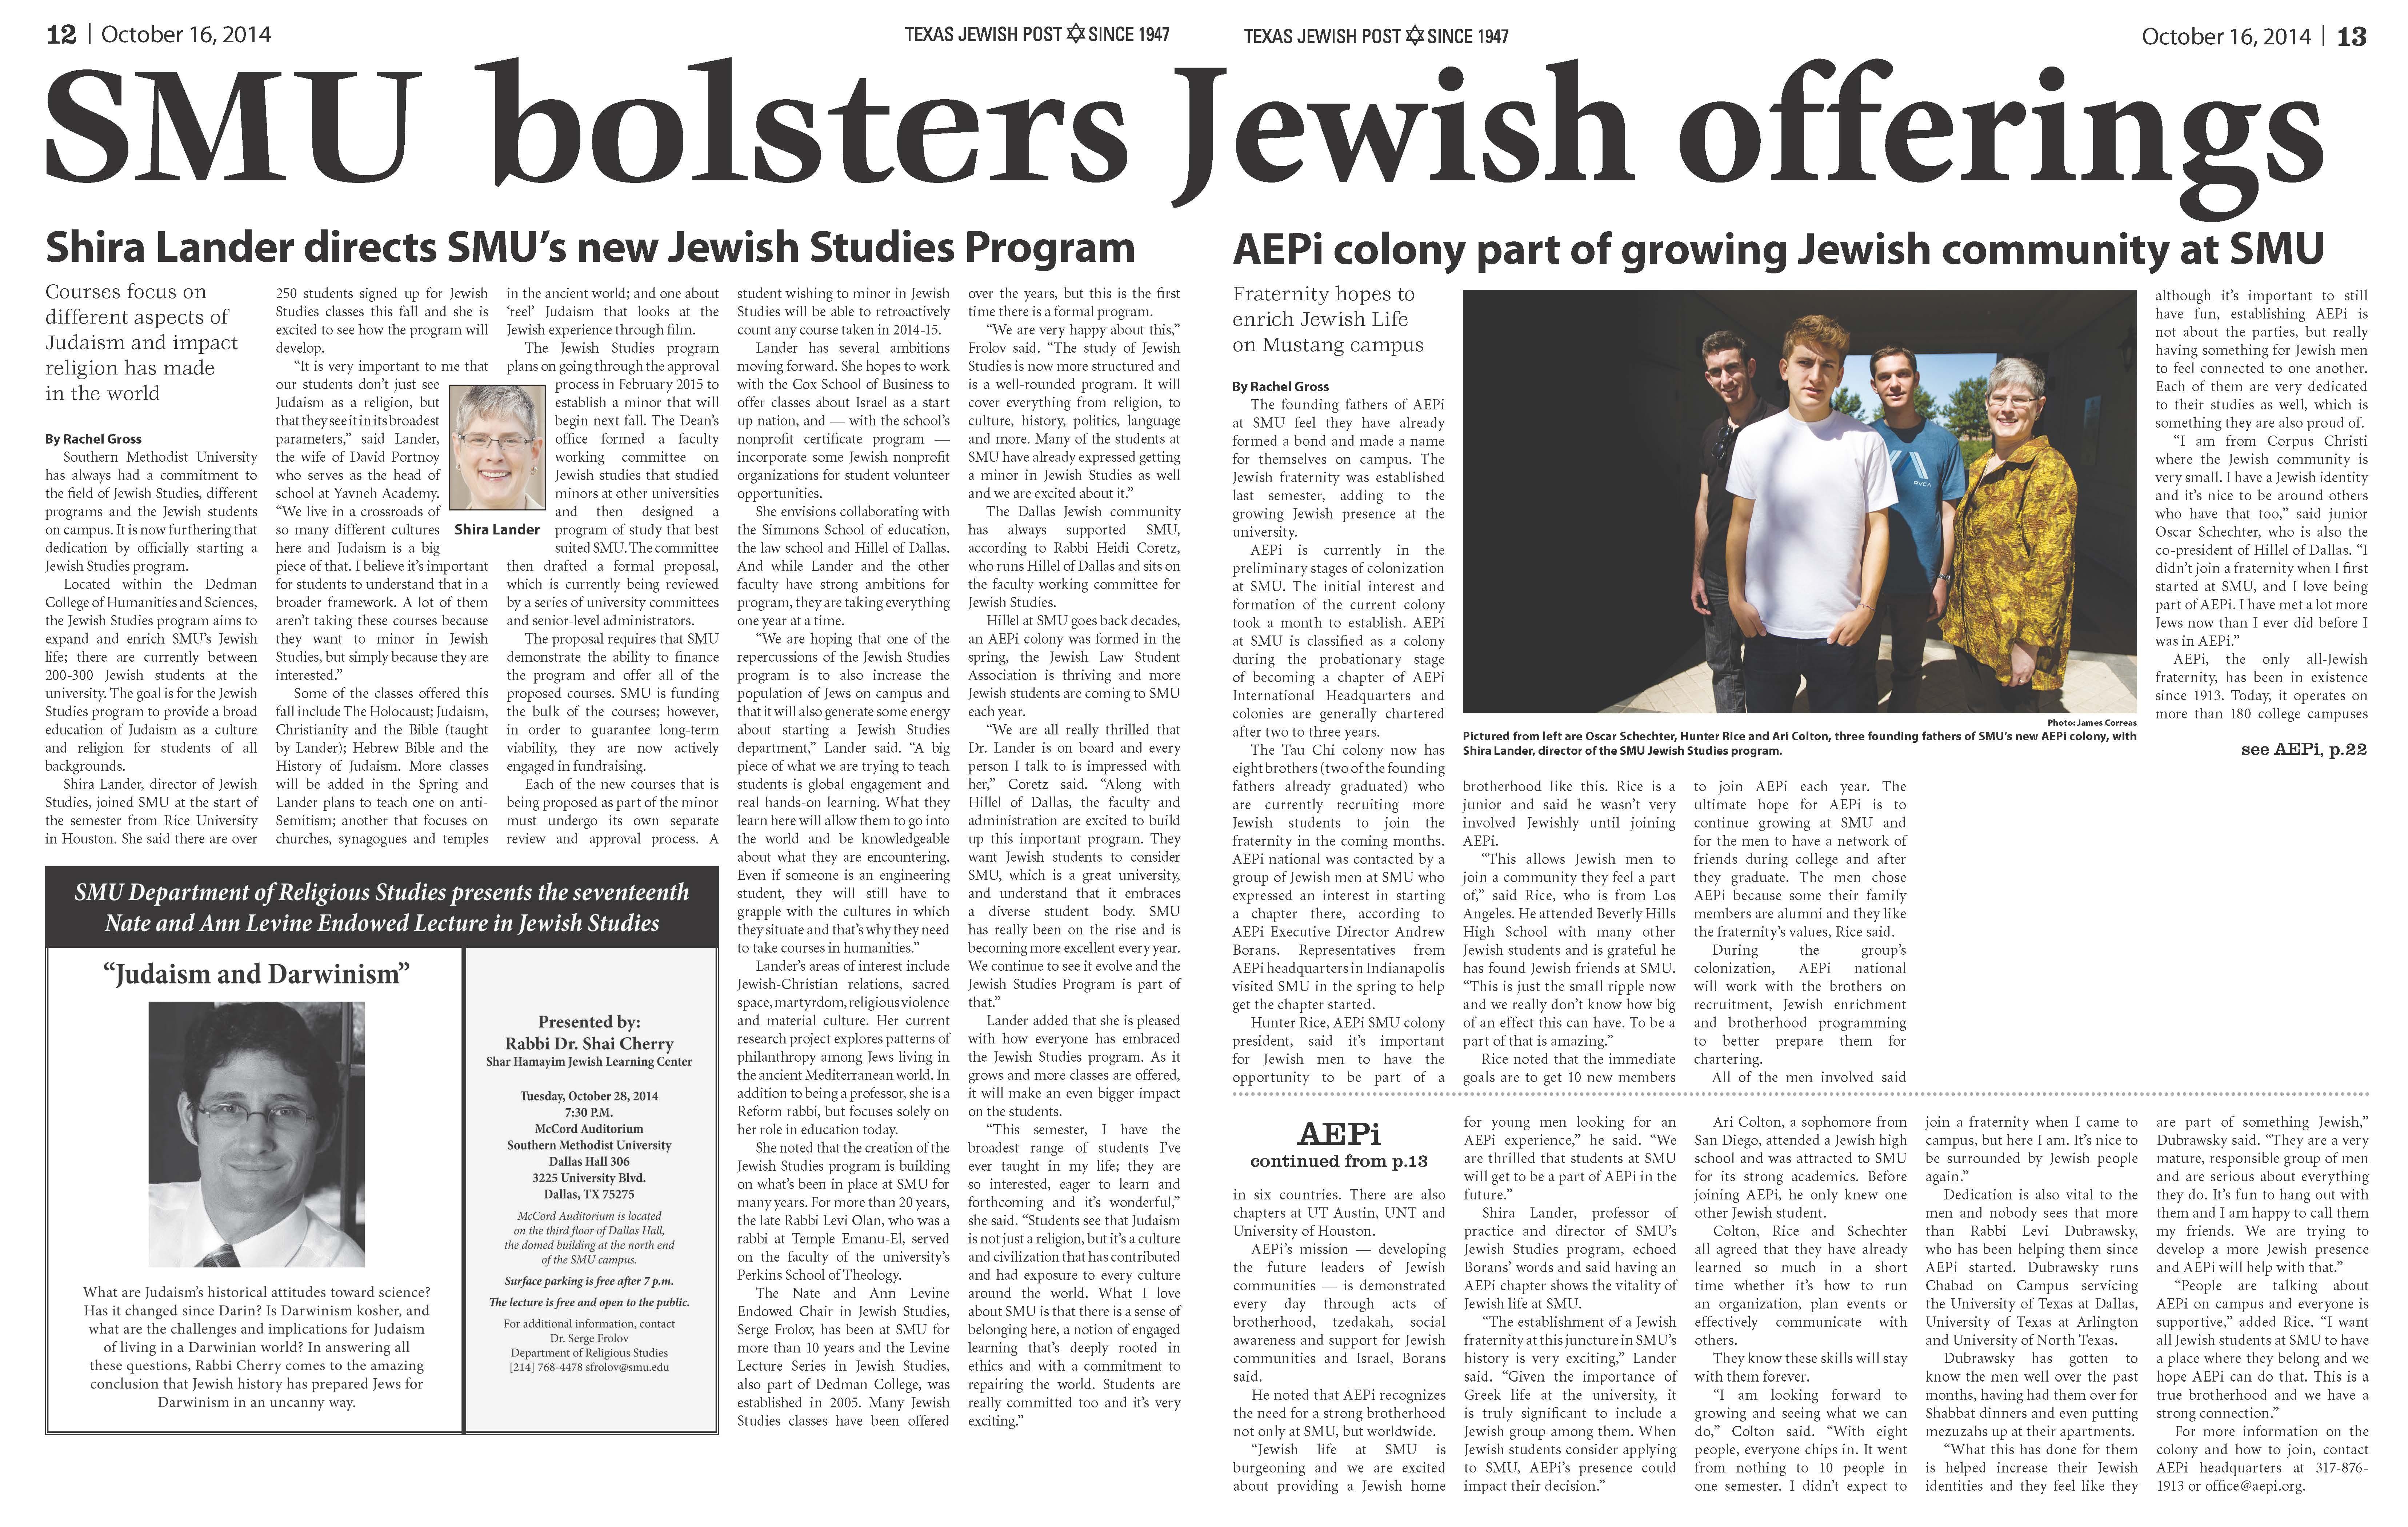 TJP Article